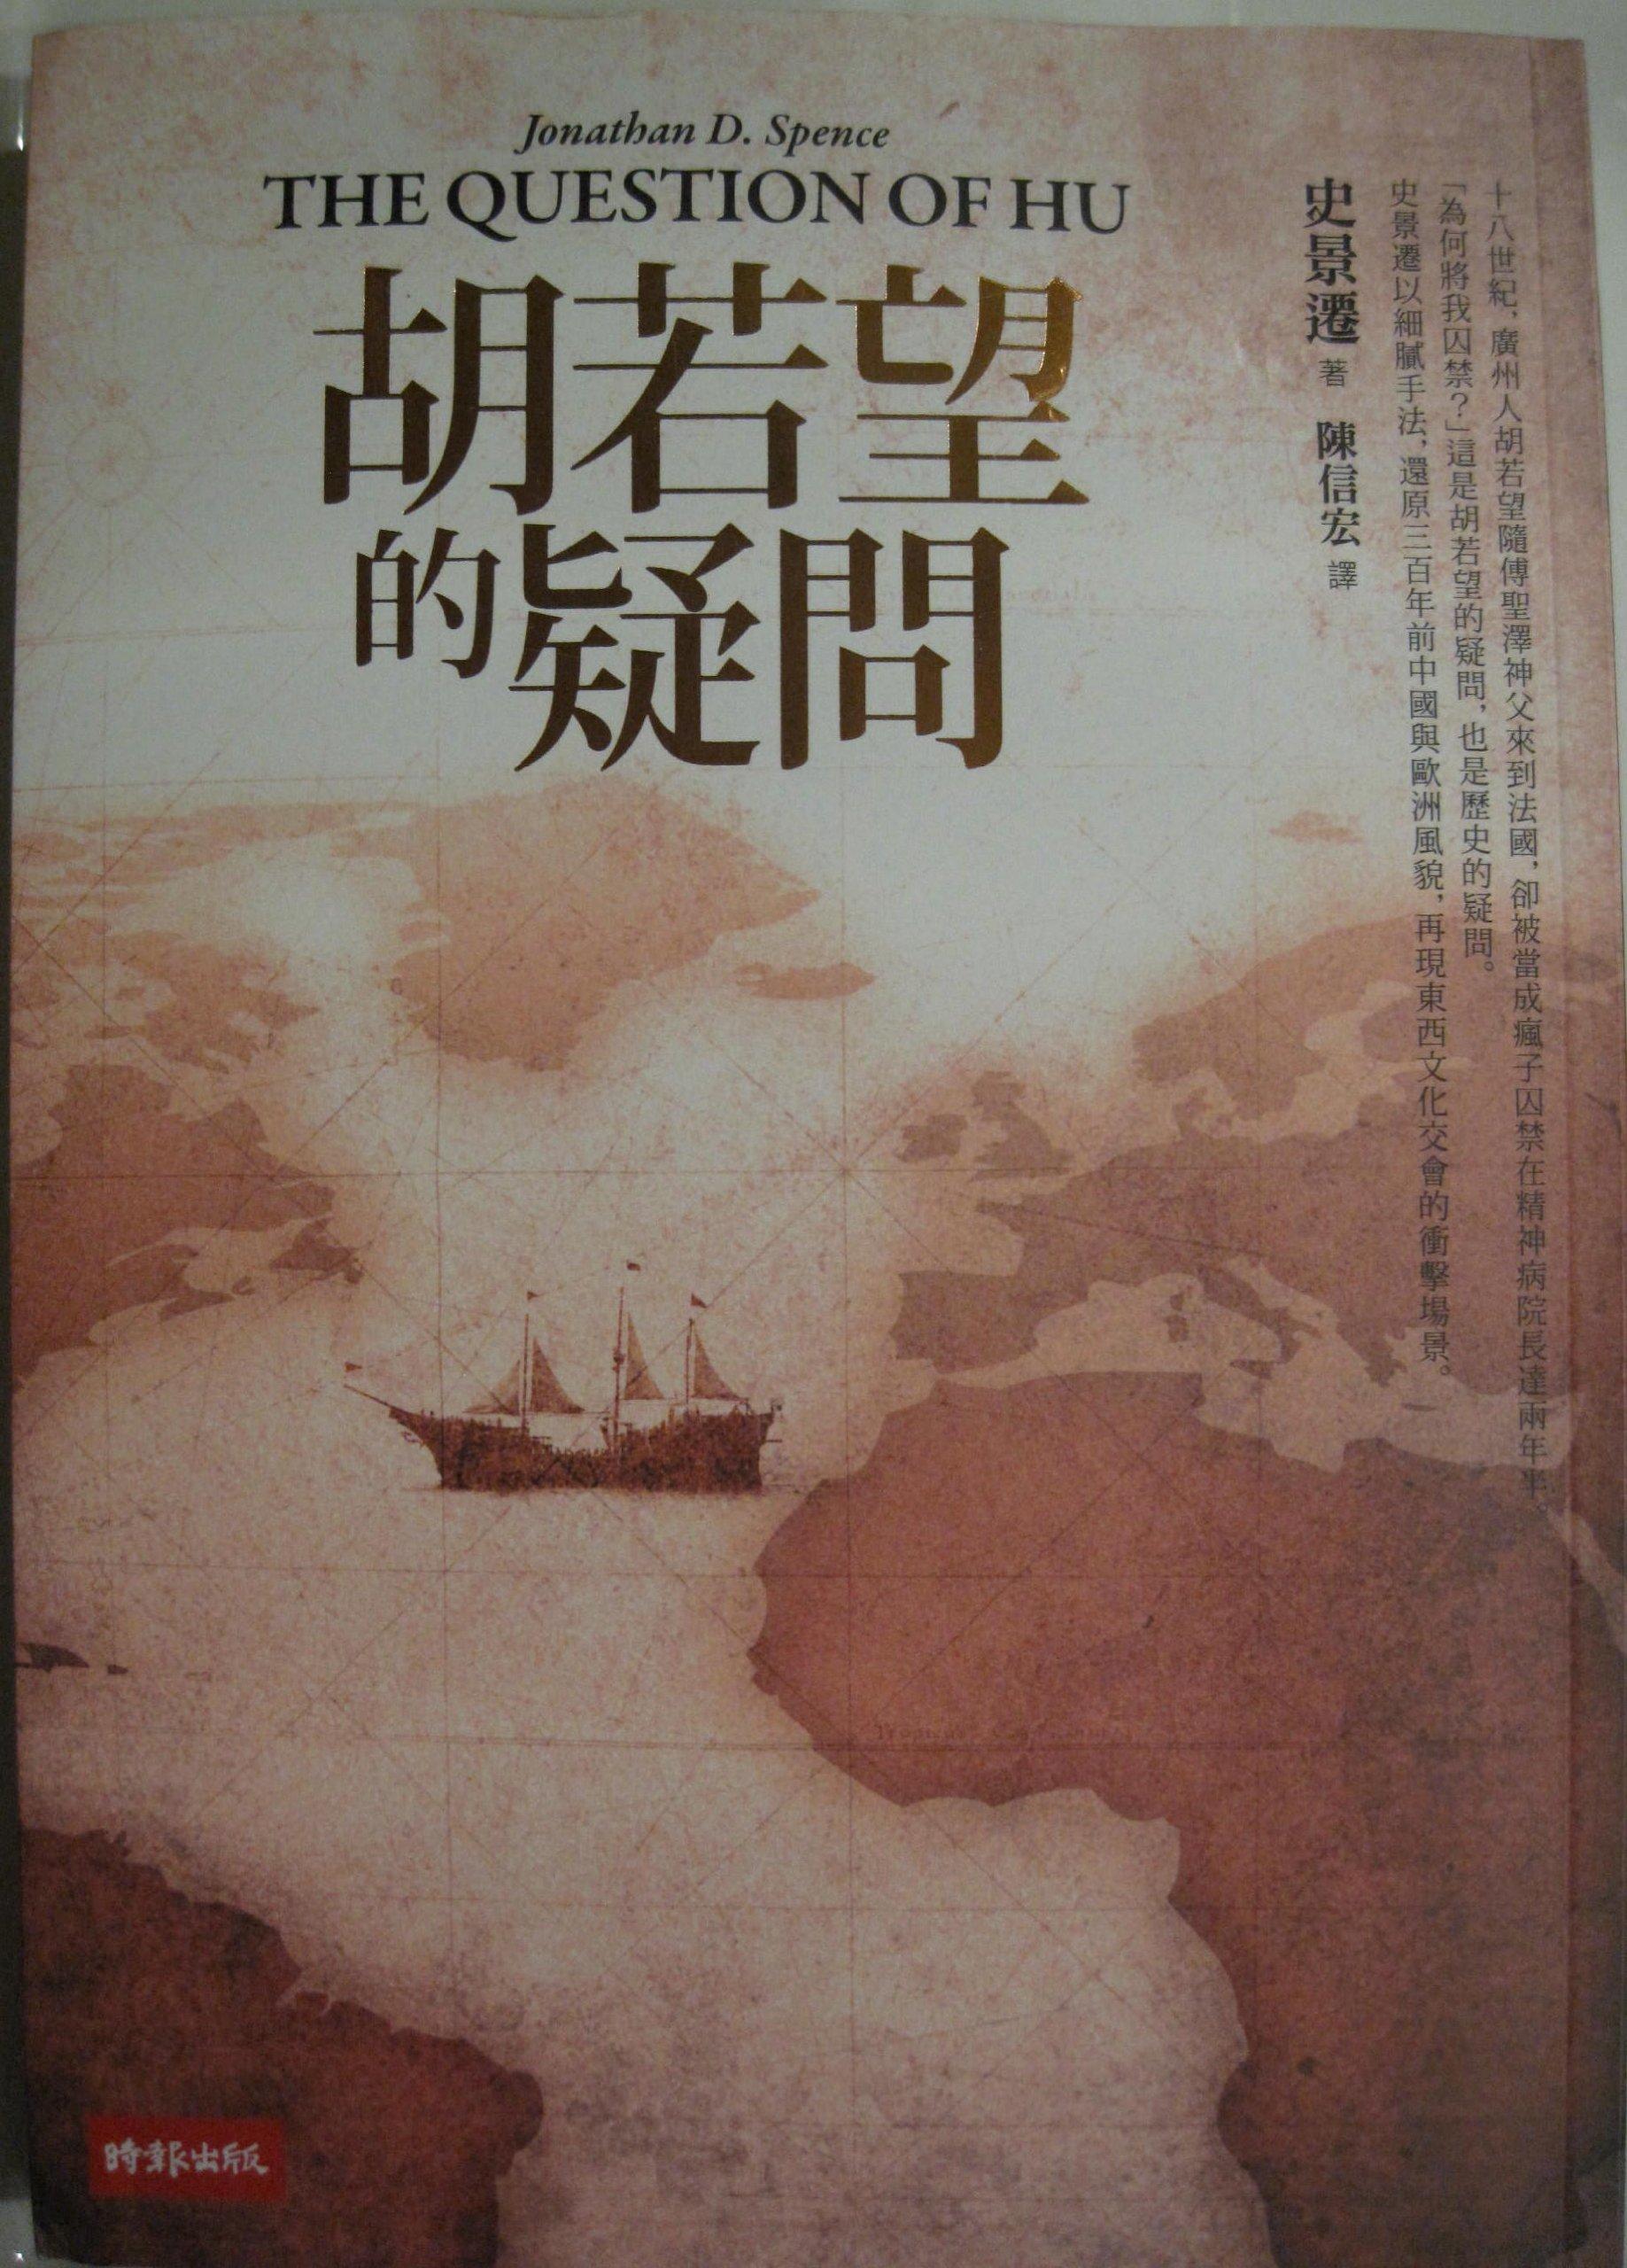 The Question of Hu (Chinese Edition) - Jonathan D. Spence: Jonathan D.  Spence, ChiaTzu Visual, Bardon-Chinese Media Agency: 9789571354279:  Amazon.com: Books